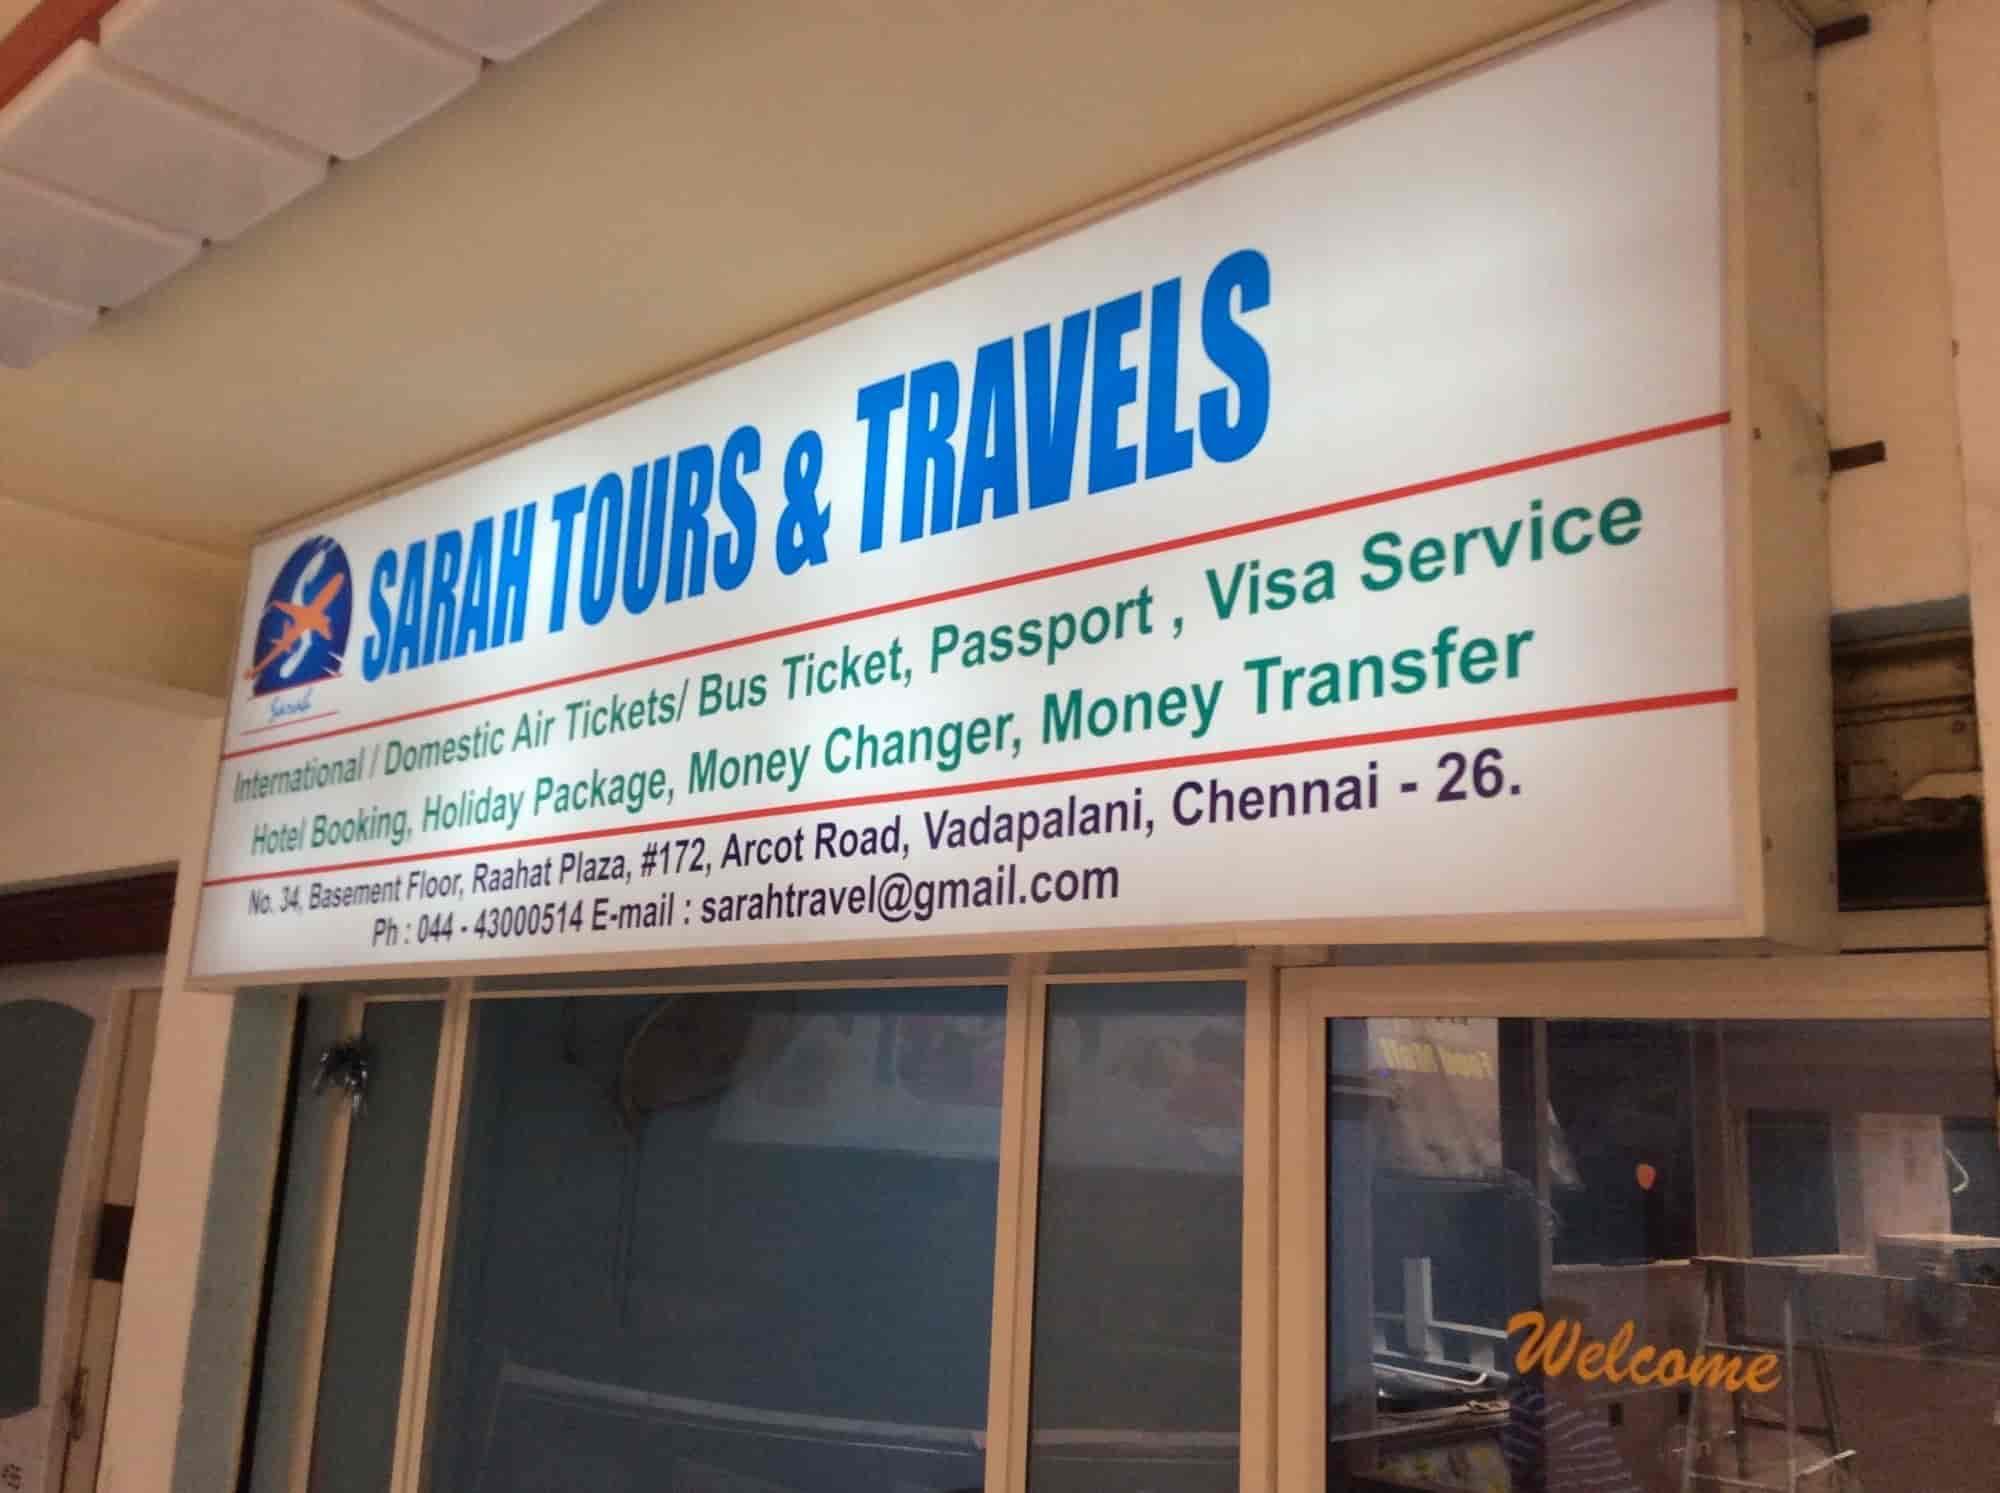 Sarah Tours & Travels, Vadapalani - Travel Agents in Chennai